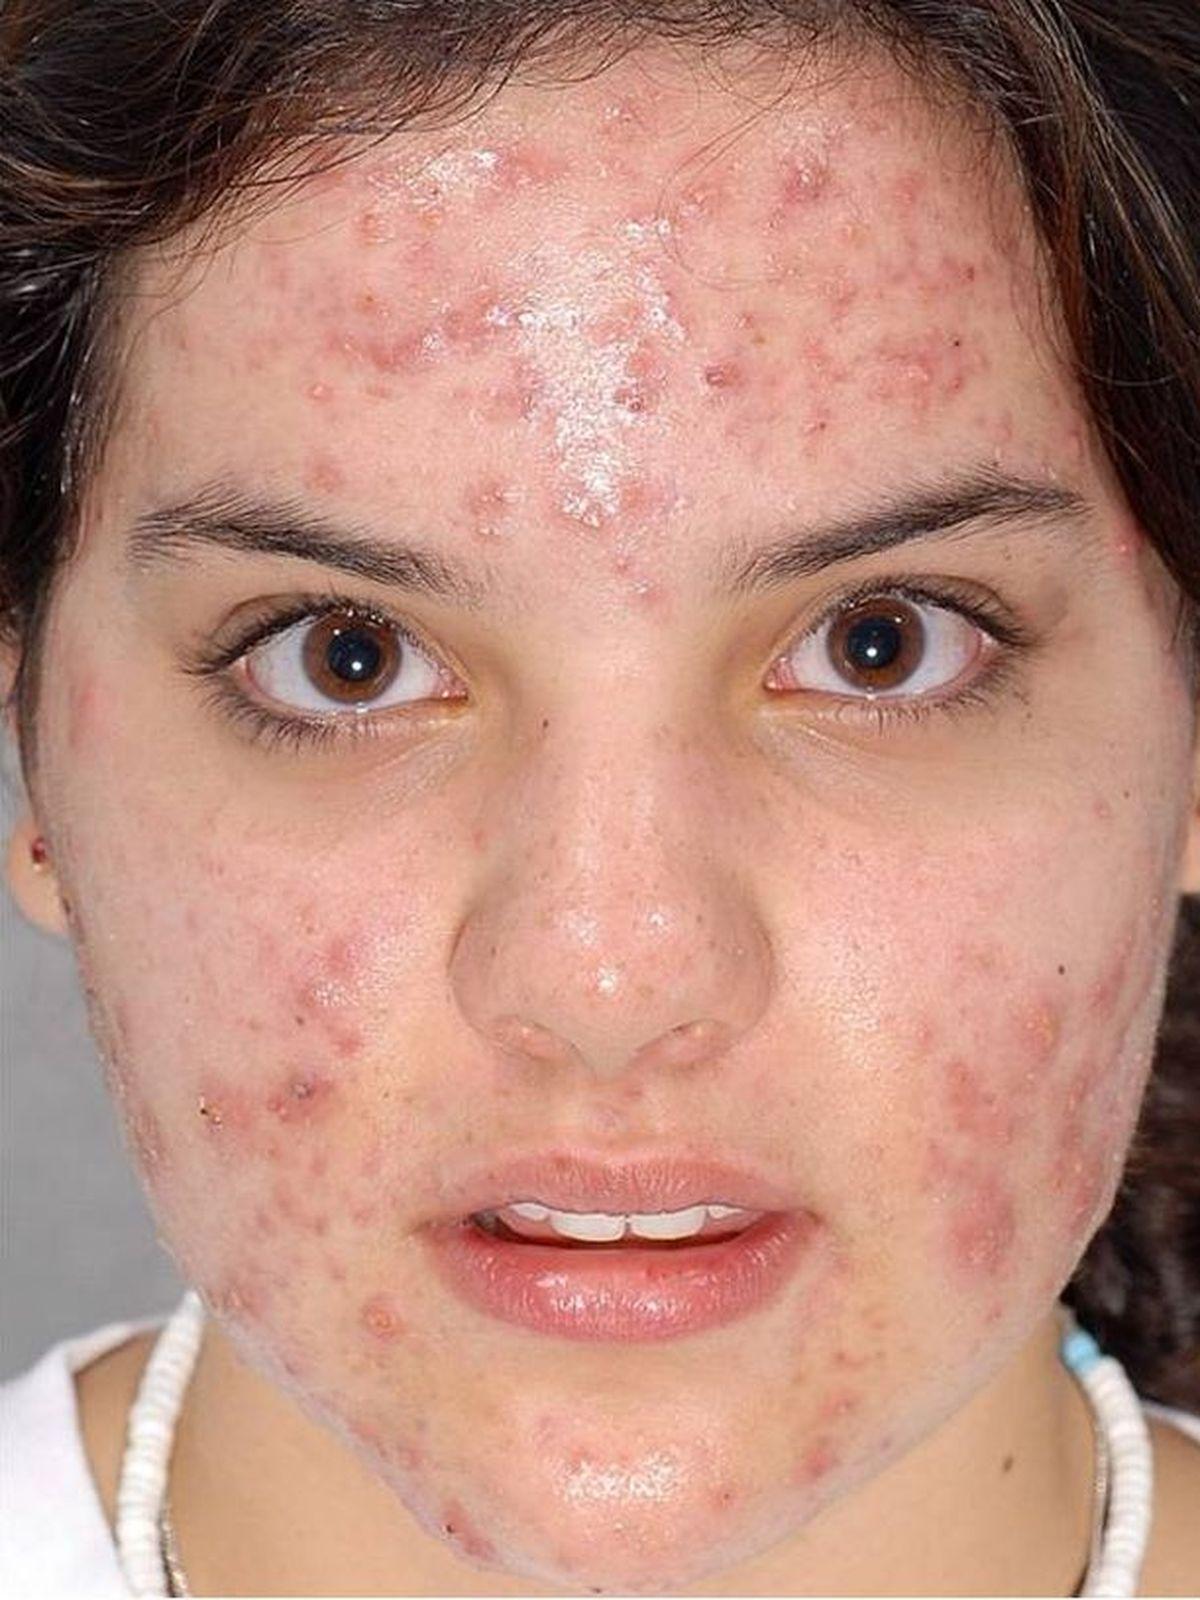 Totul despre acnee: cauze, tratamente eficiente si preventie